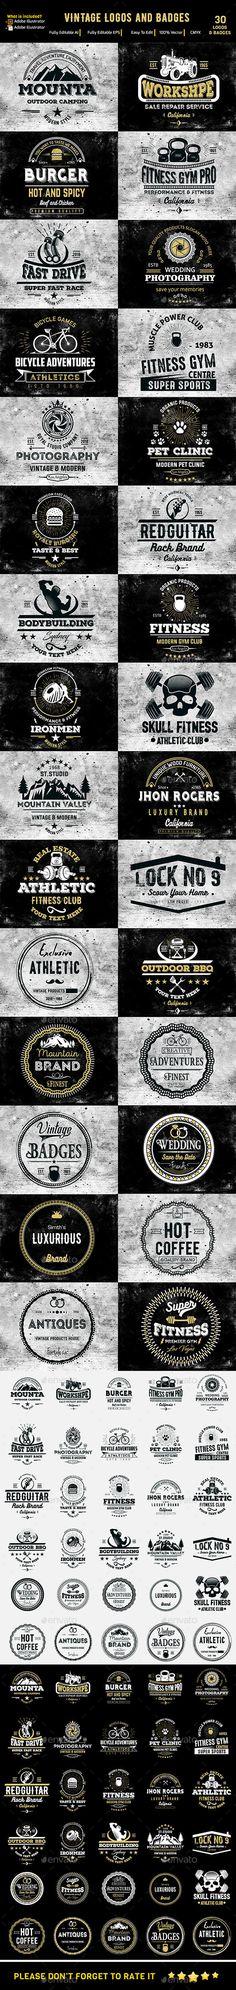 Vintage Logos & Badges Templates Vector EPS, AI Illustrator